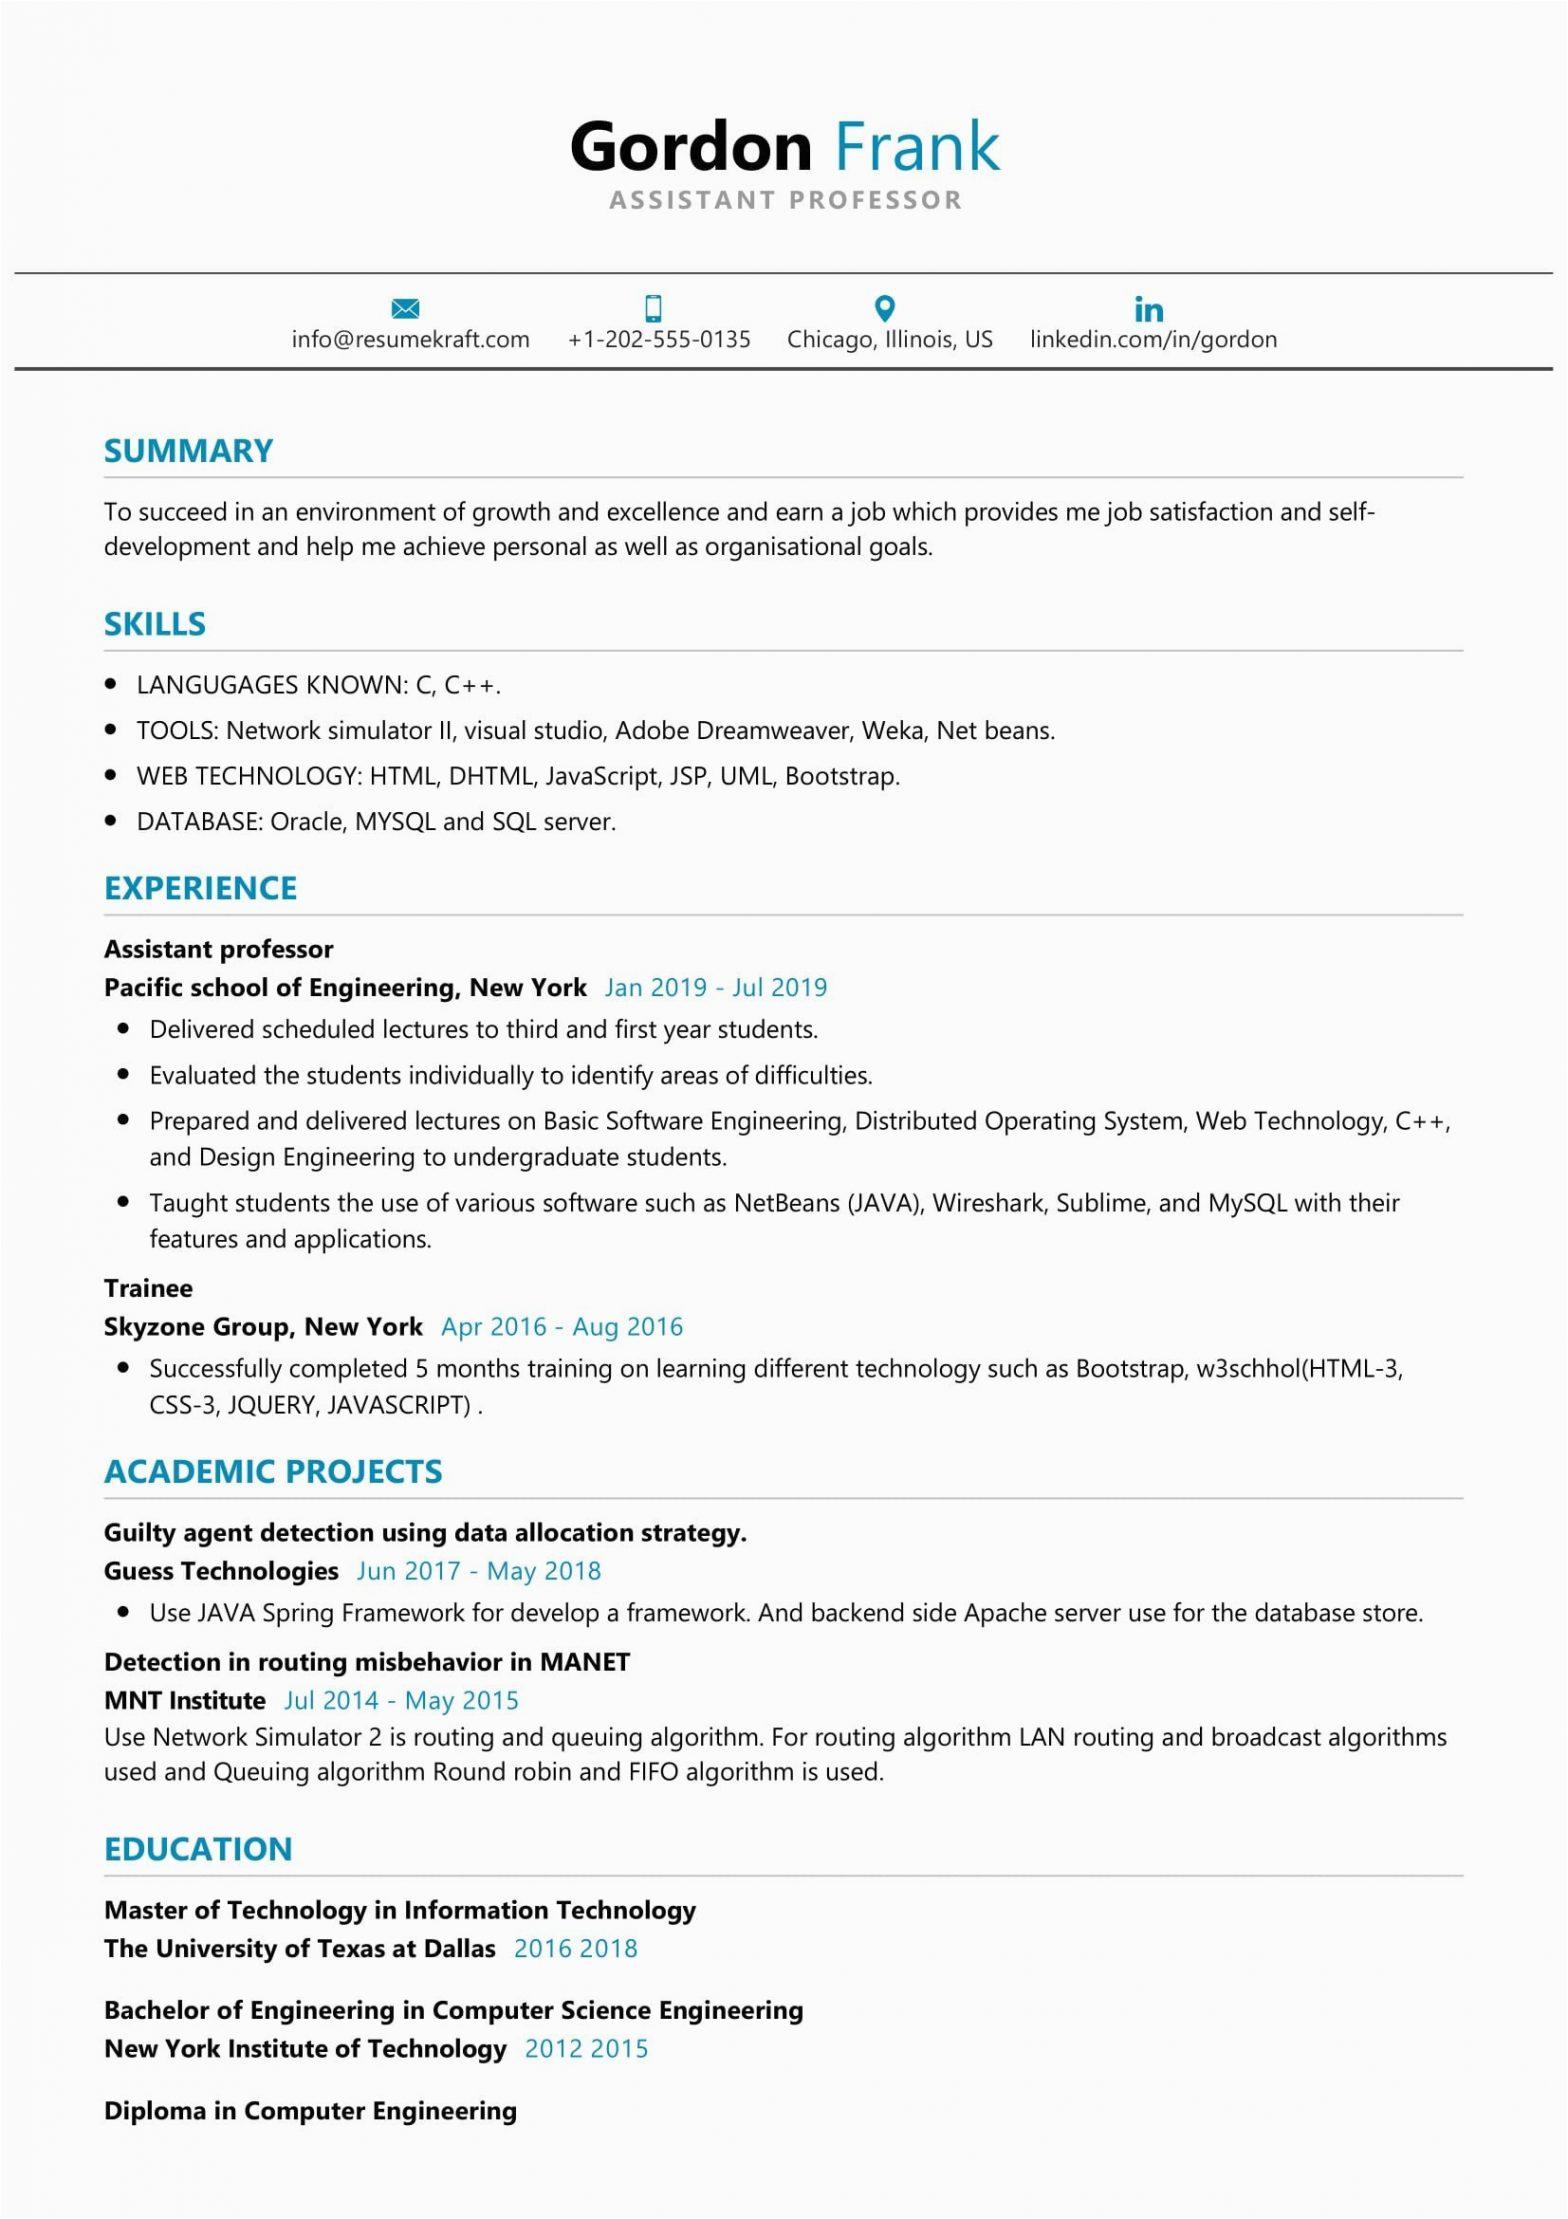 Sample Resume for assistant Professor Management assistant Professor Resume Sample 2021